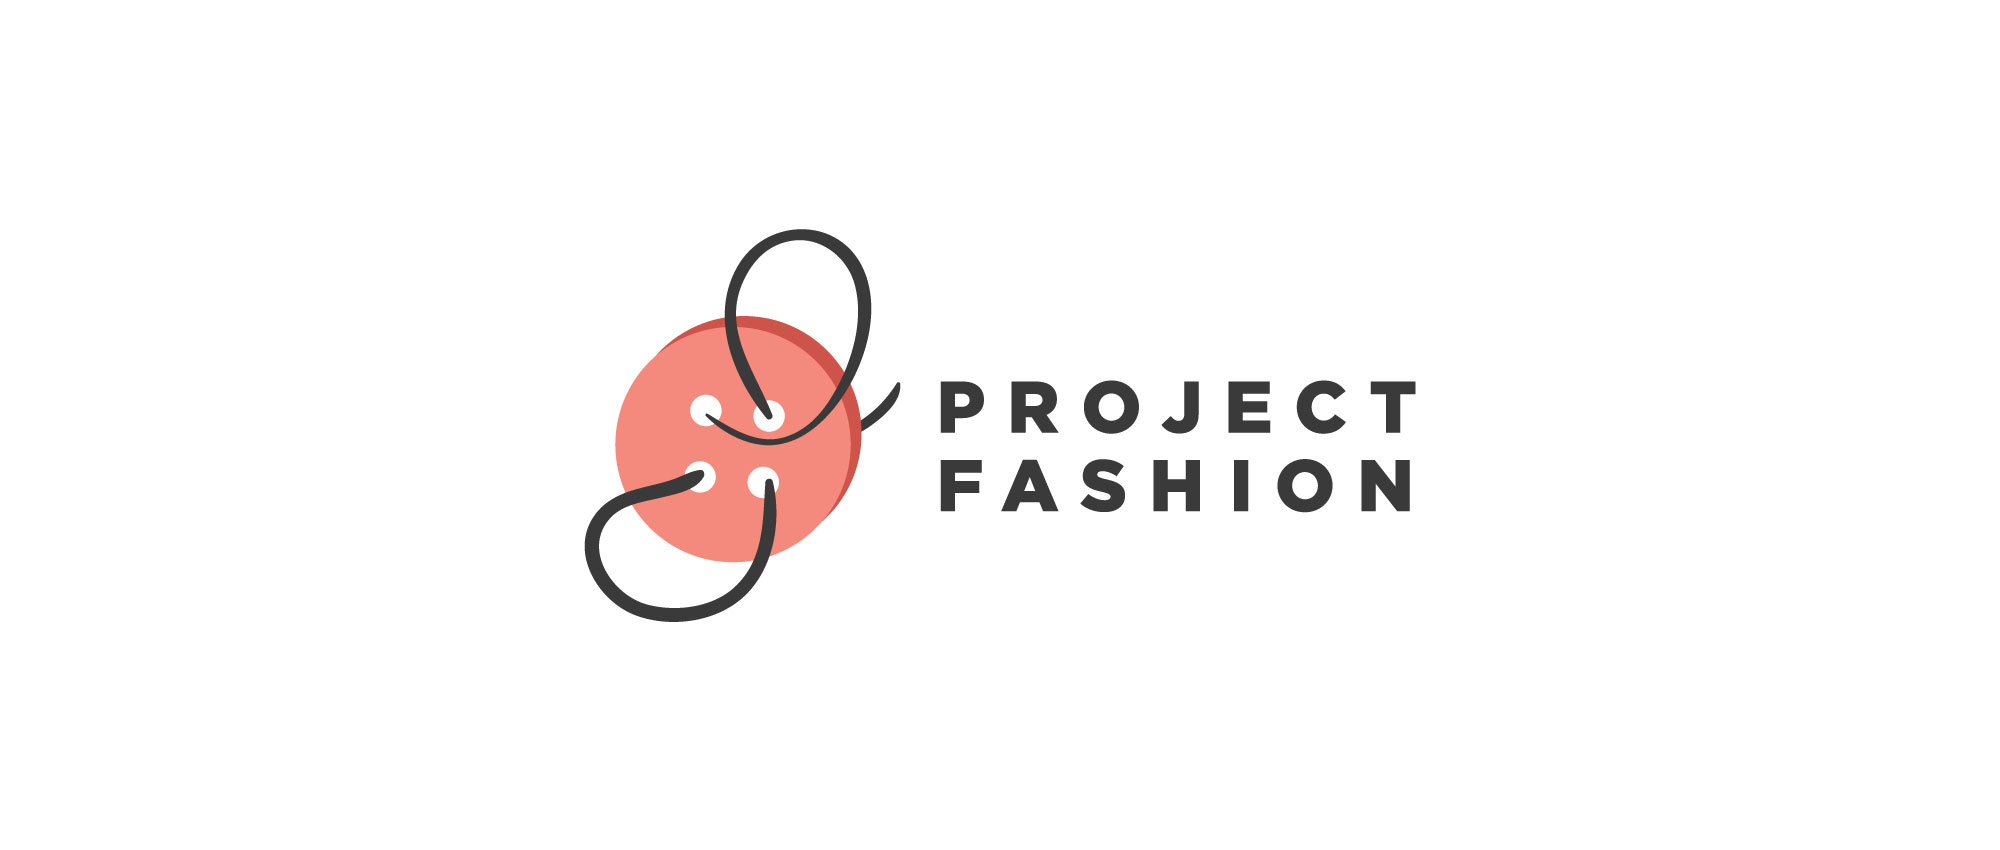 Project Fashion Branding